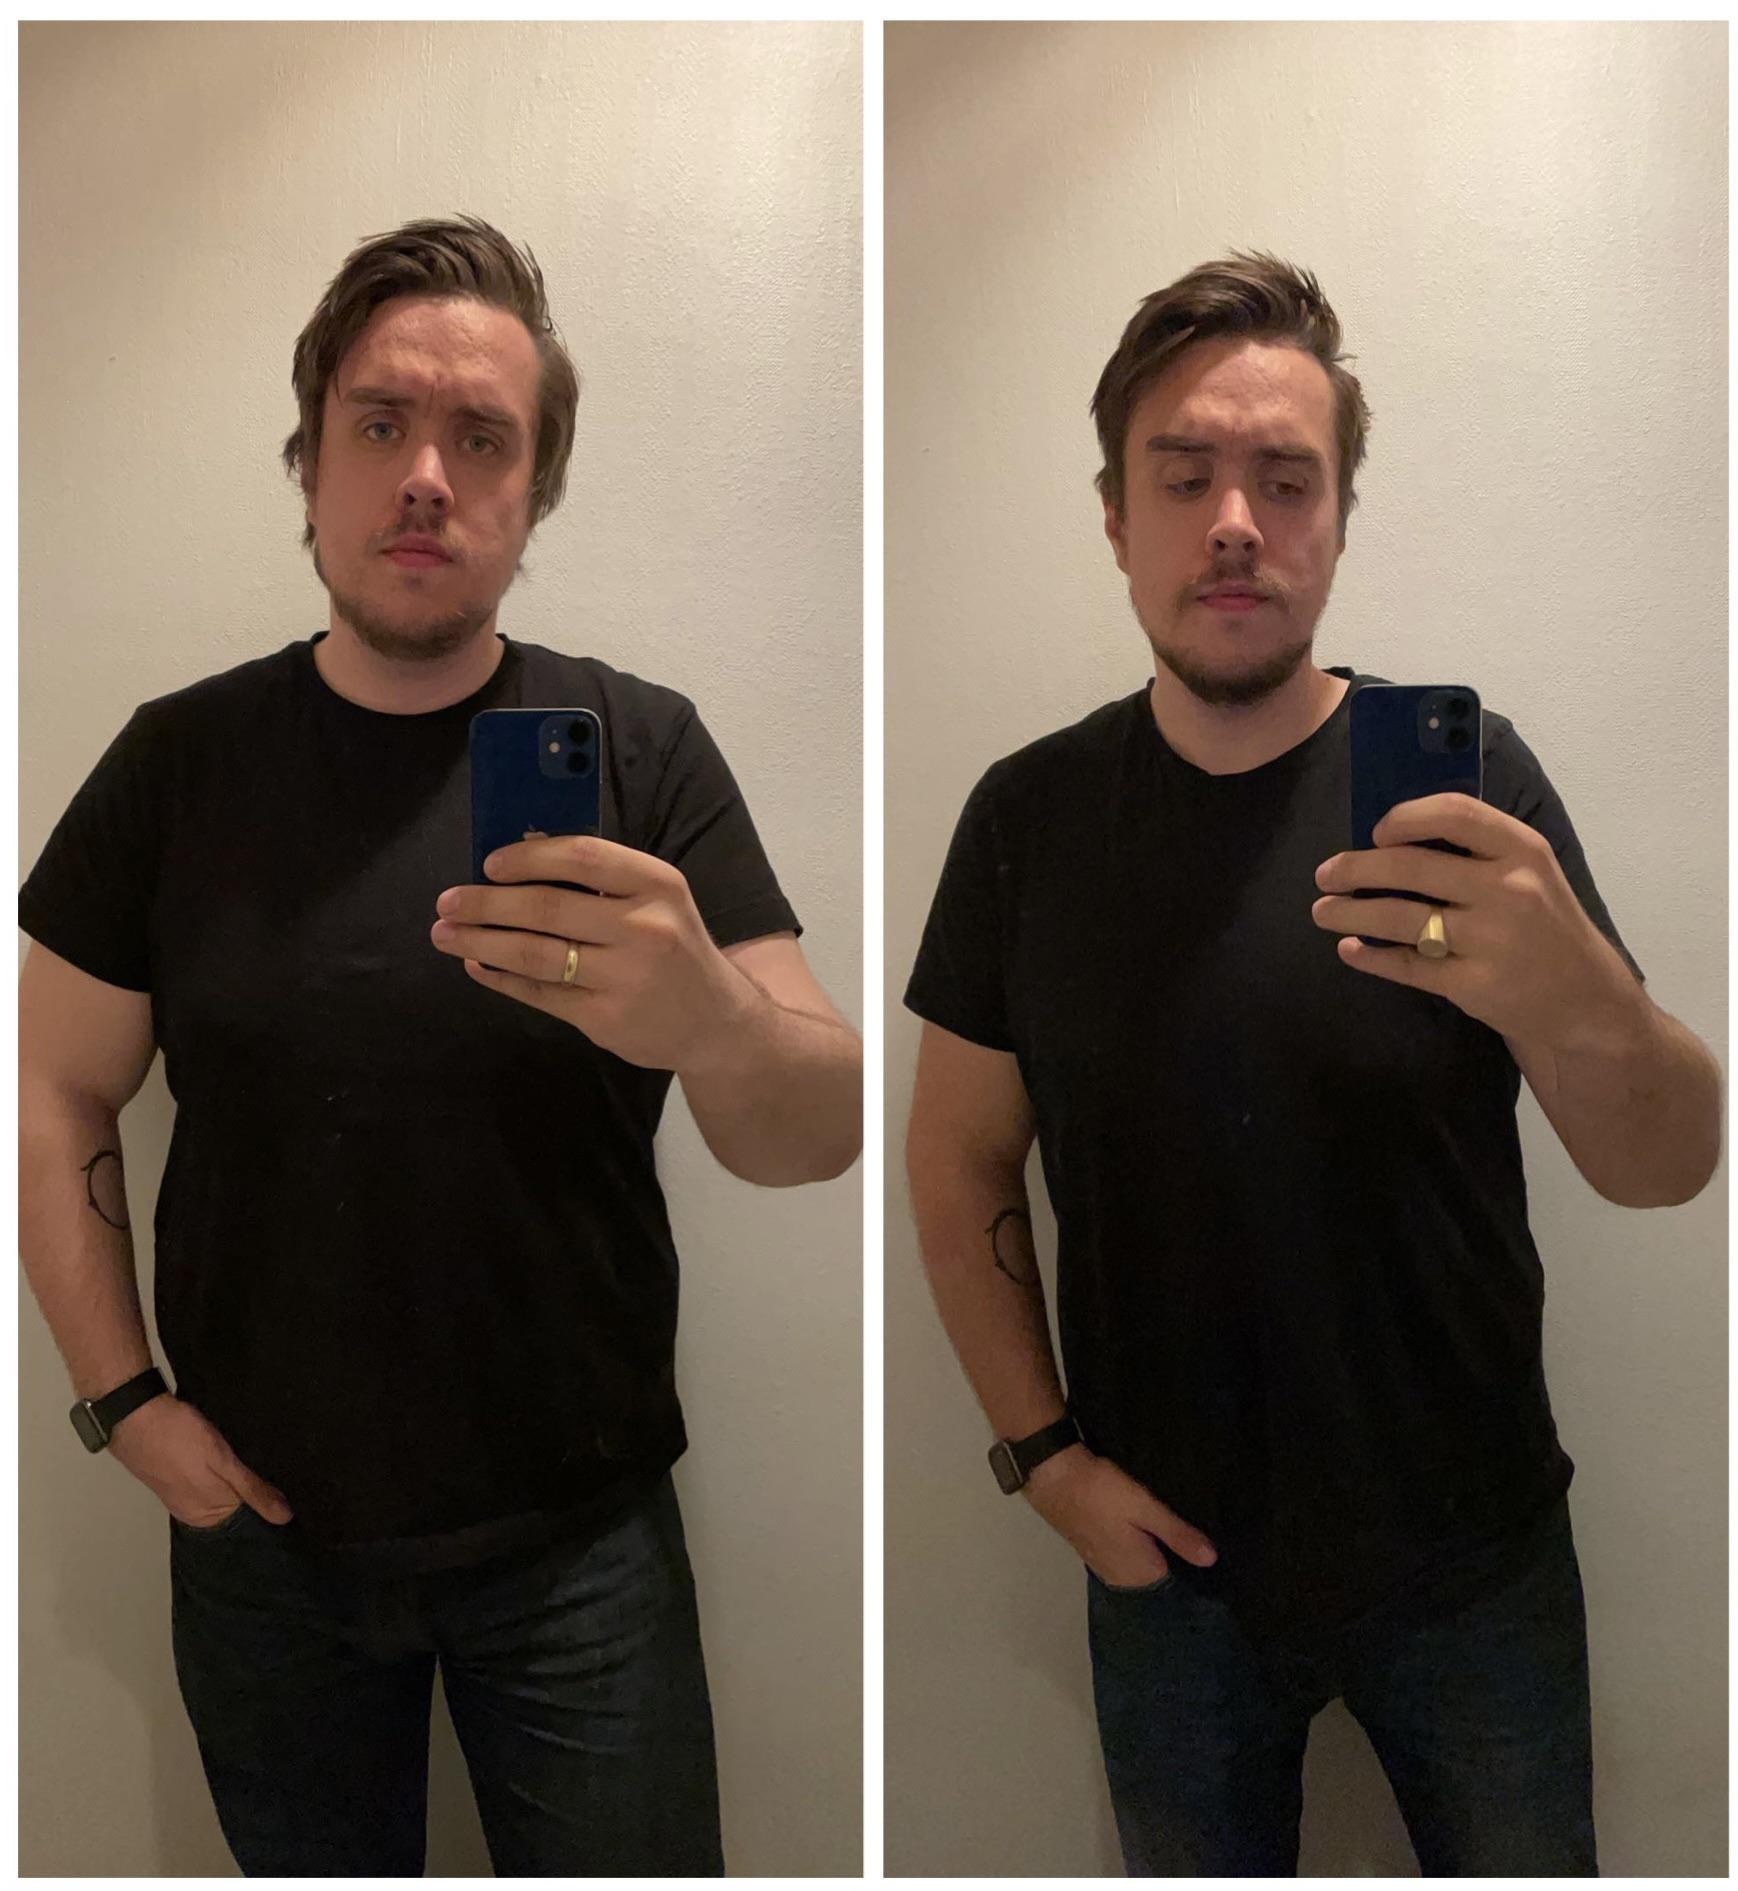 6 foot 1 Male 35 lbs Weight Loss 250 lbs to 215 lbs